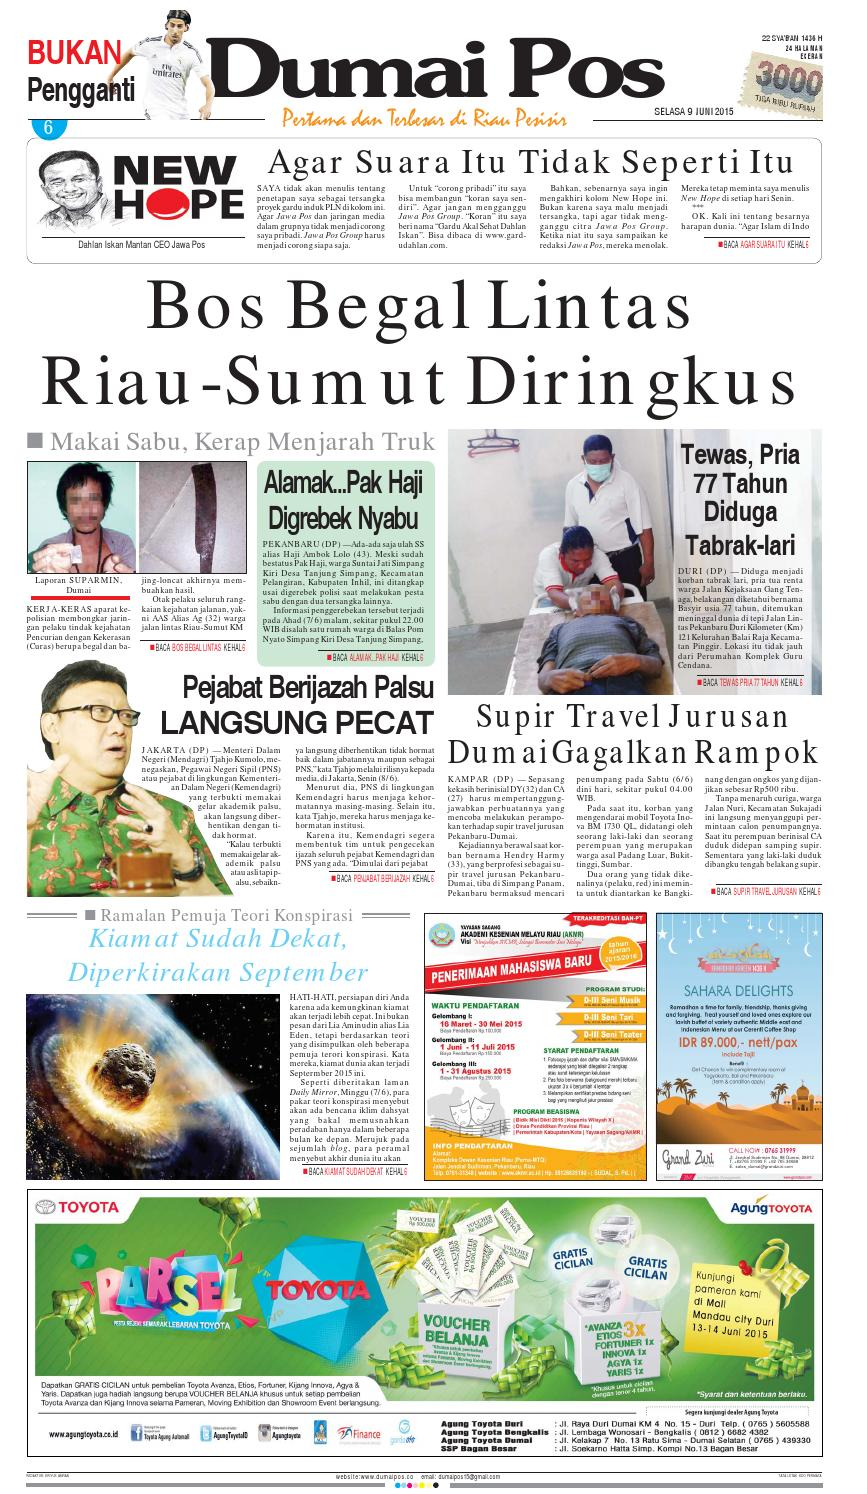 Dumaipos 9 Juni 2015 By Dumai Pos Issuu Produk Ukm Bumn Bunge Tanjung Betabur